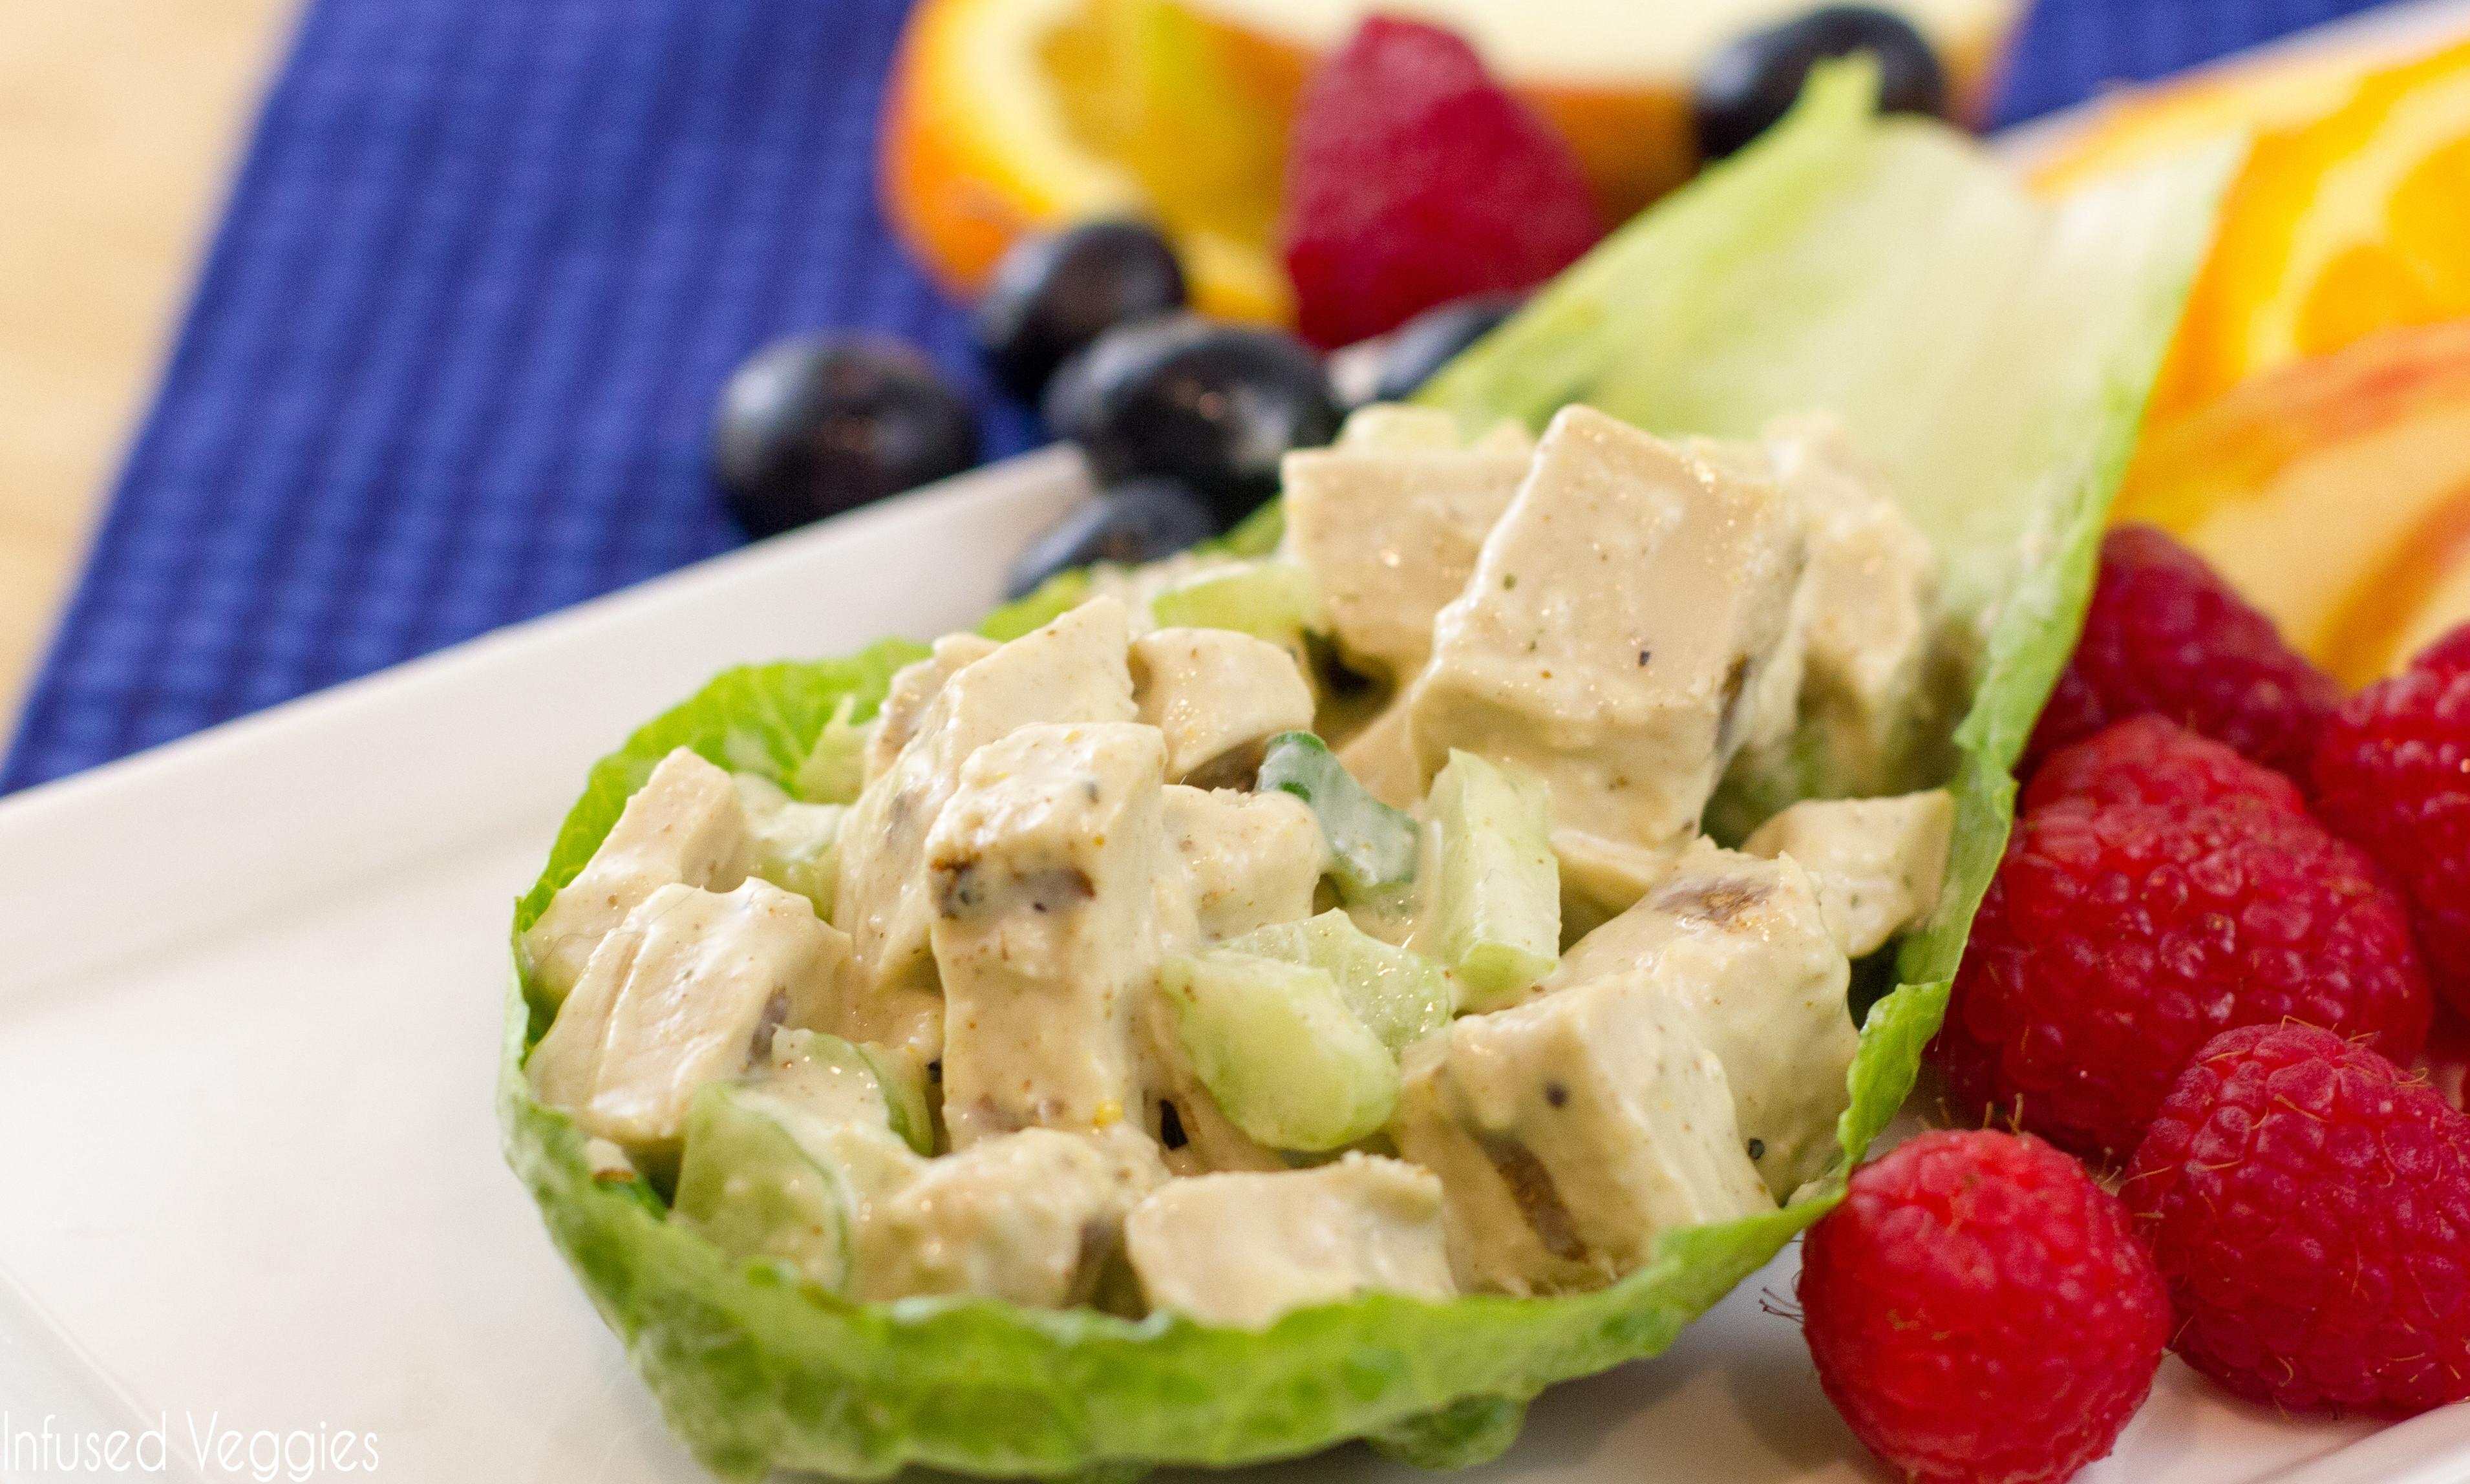 Vegan Chicken Salad  Easy Vegan Chicken Salad Vegan Gluten Free Life